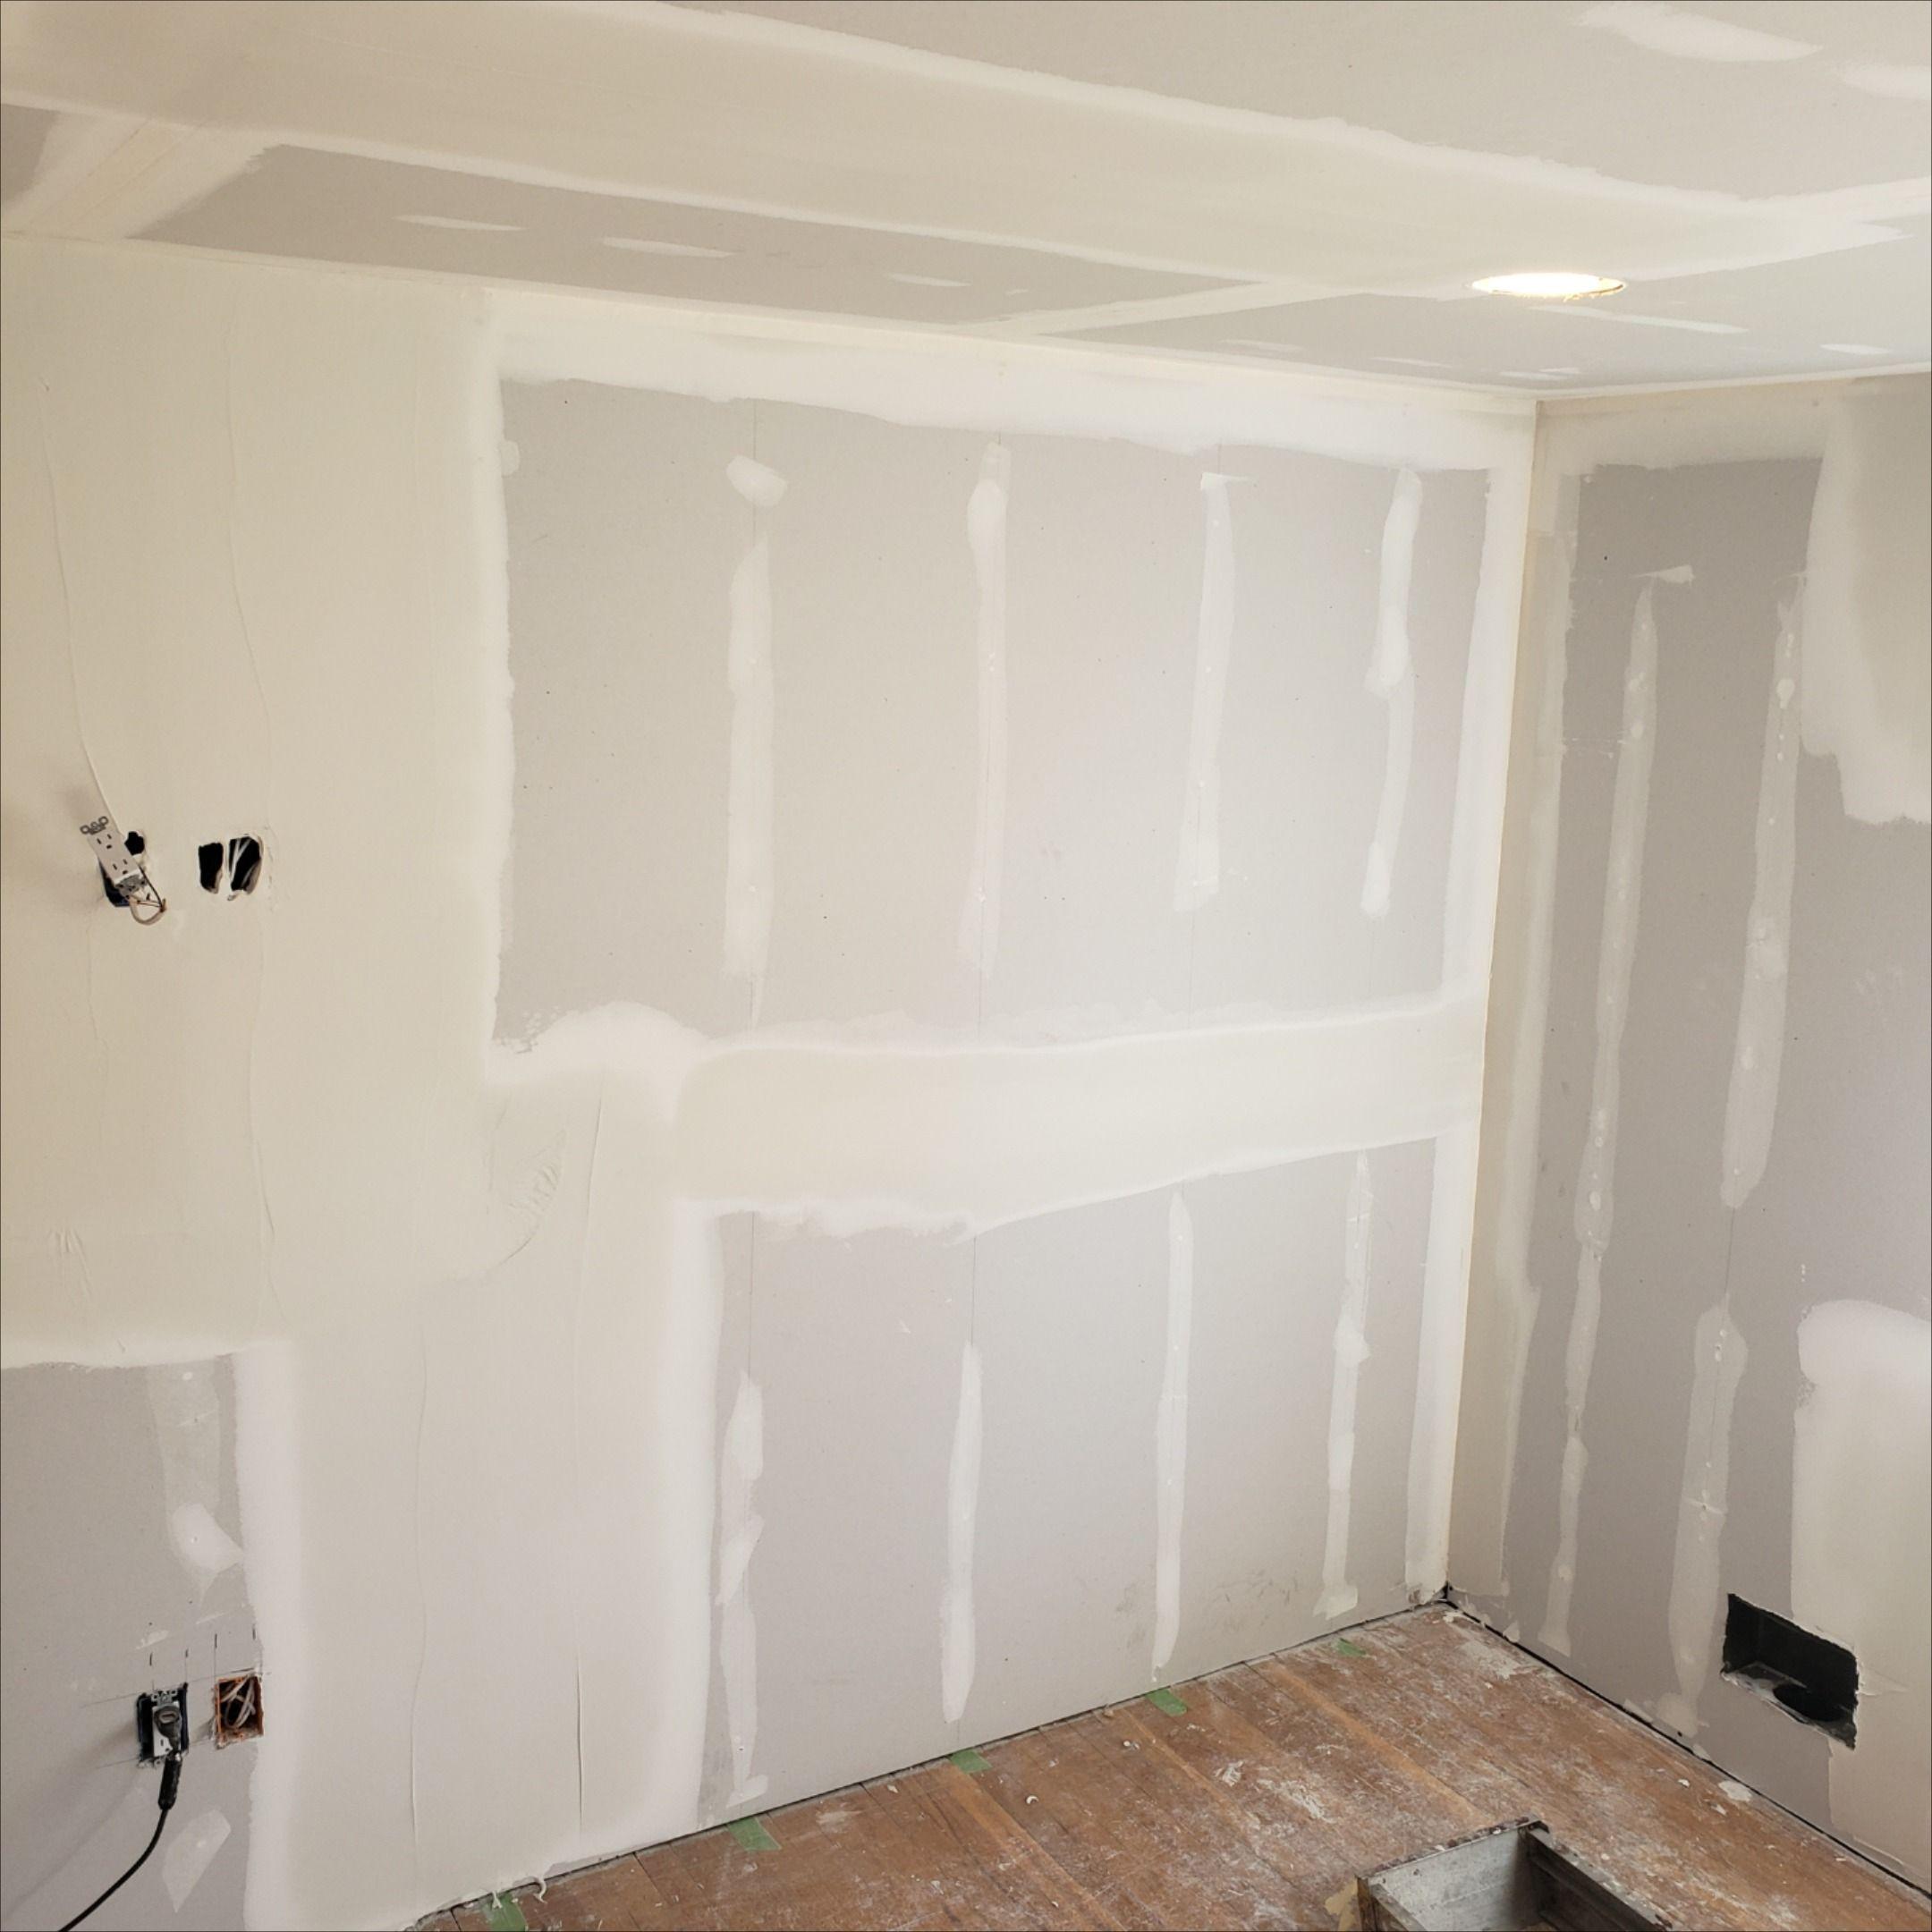 Skim Coating Service In Rockland County Ny Jll Painting Sheetrock Repair Drywall Repair Smooth Walls